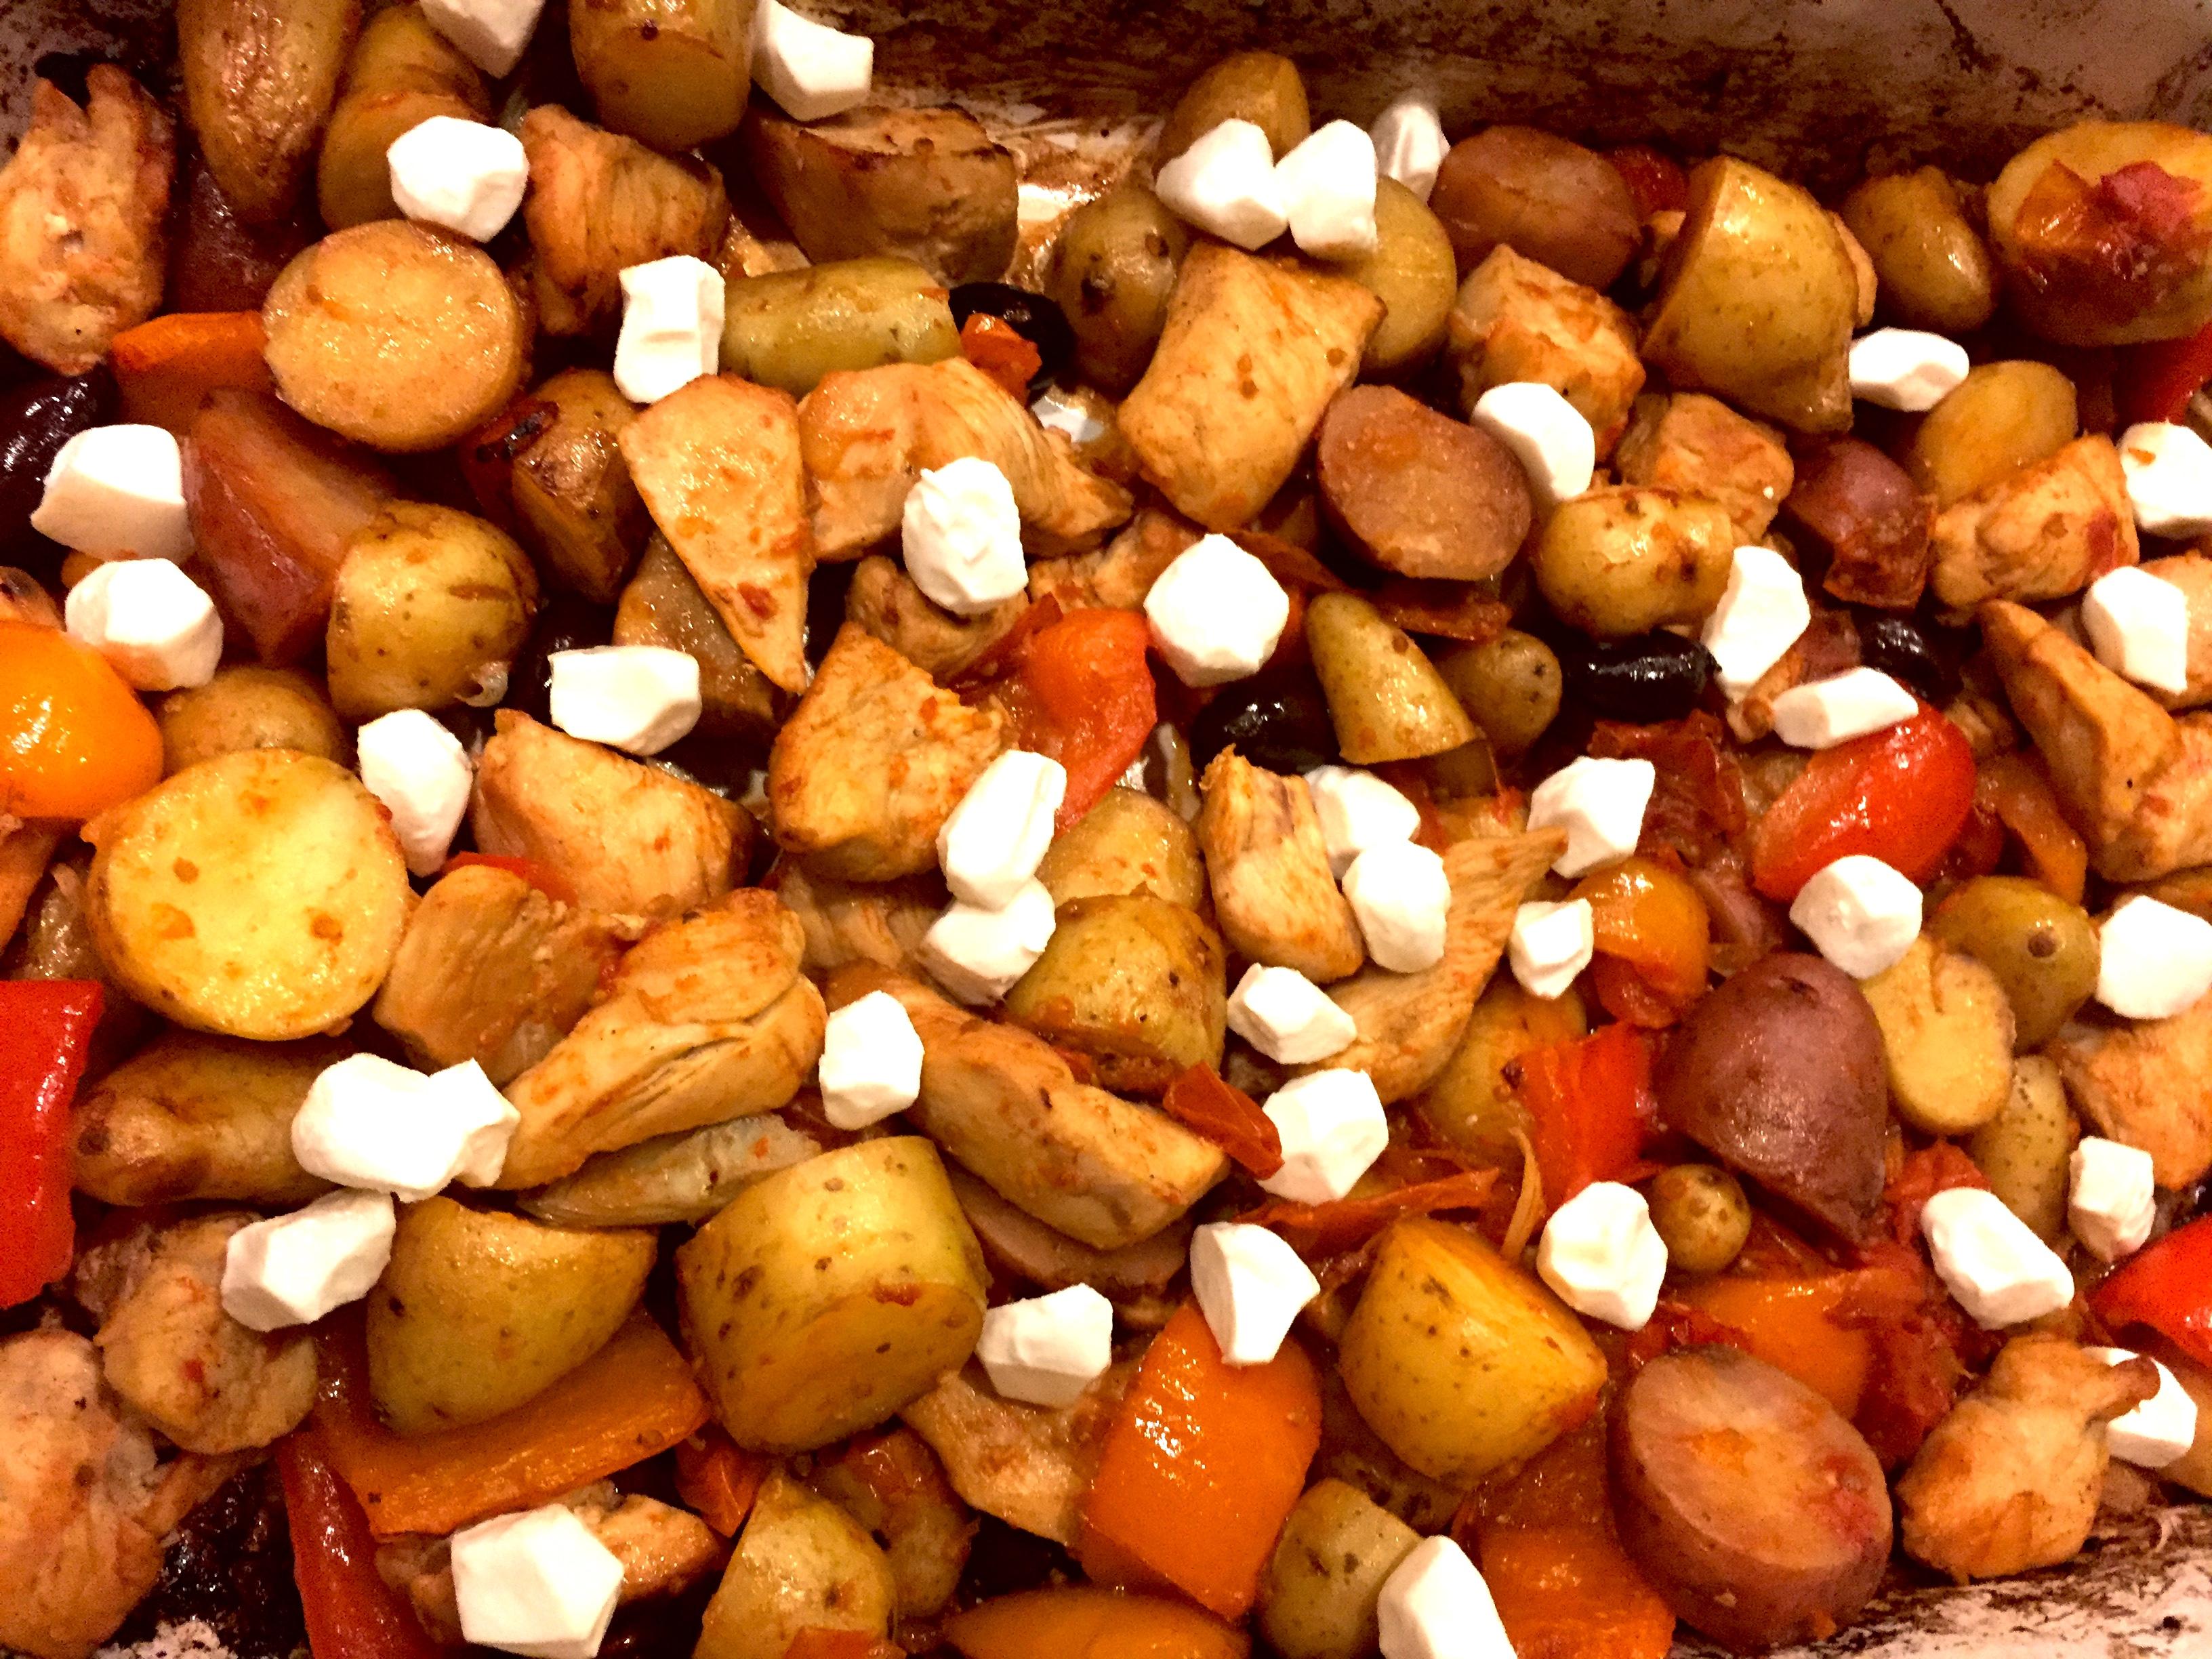 Mediterranean Bake-Ingredients-Tomatoes-onions-olive oil-Crockpot Empire